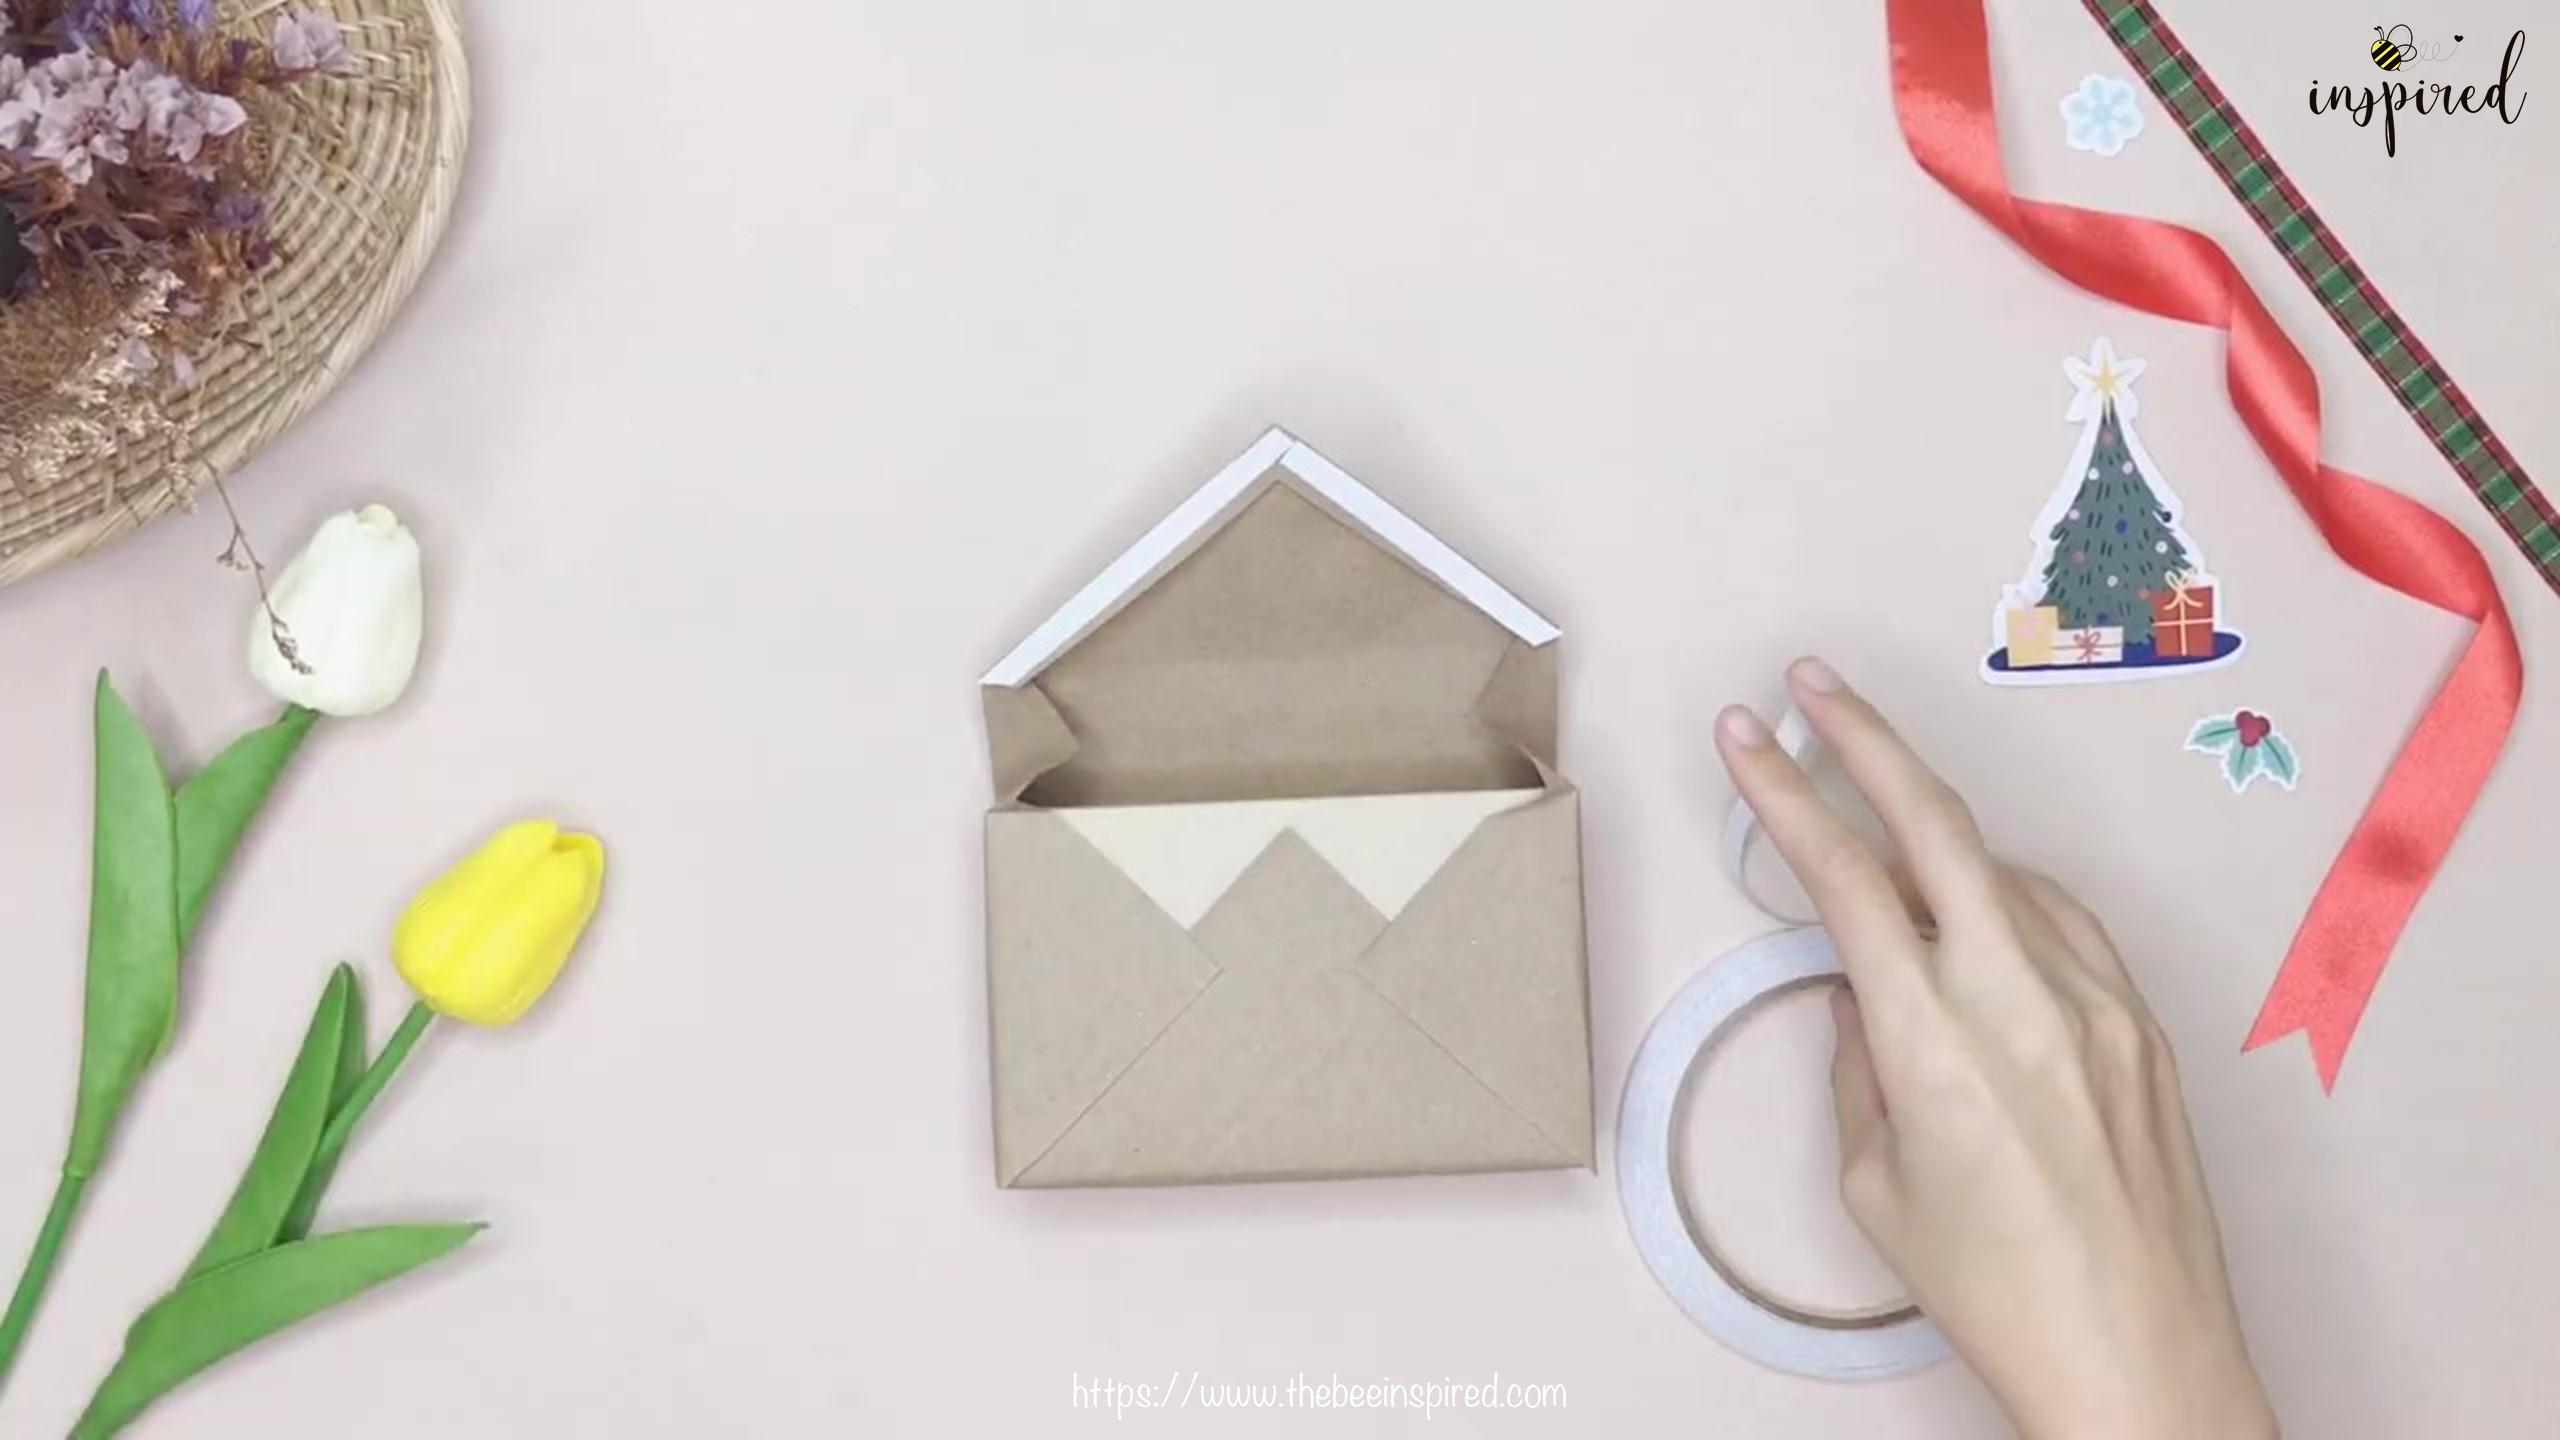 DIY วิธีห่อของขวัญวันวาเลนไทน์ วันปีใหม่ วันคริสมาส & วันเกิด แบบประหยัดกระดาษ_ Gift Wrapping Hack_16